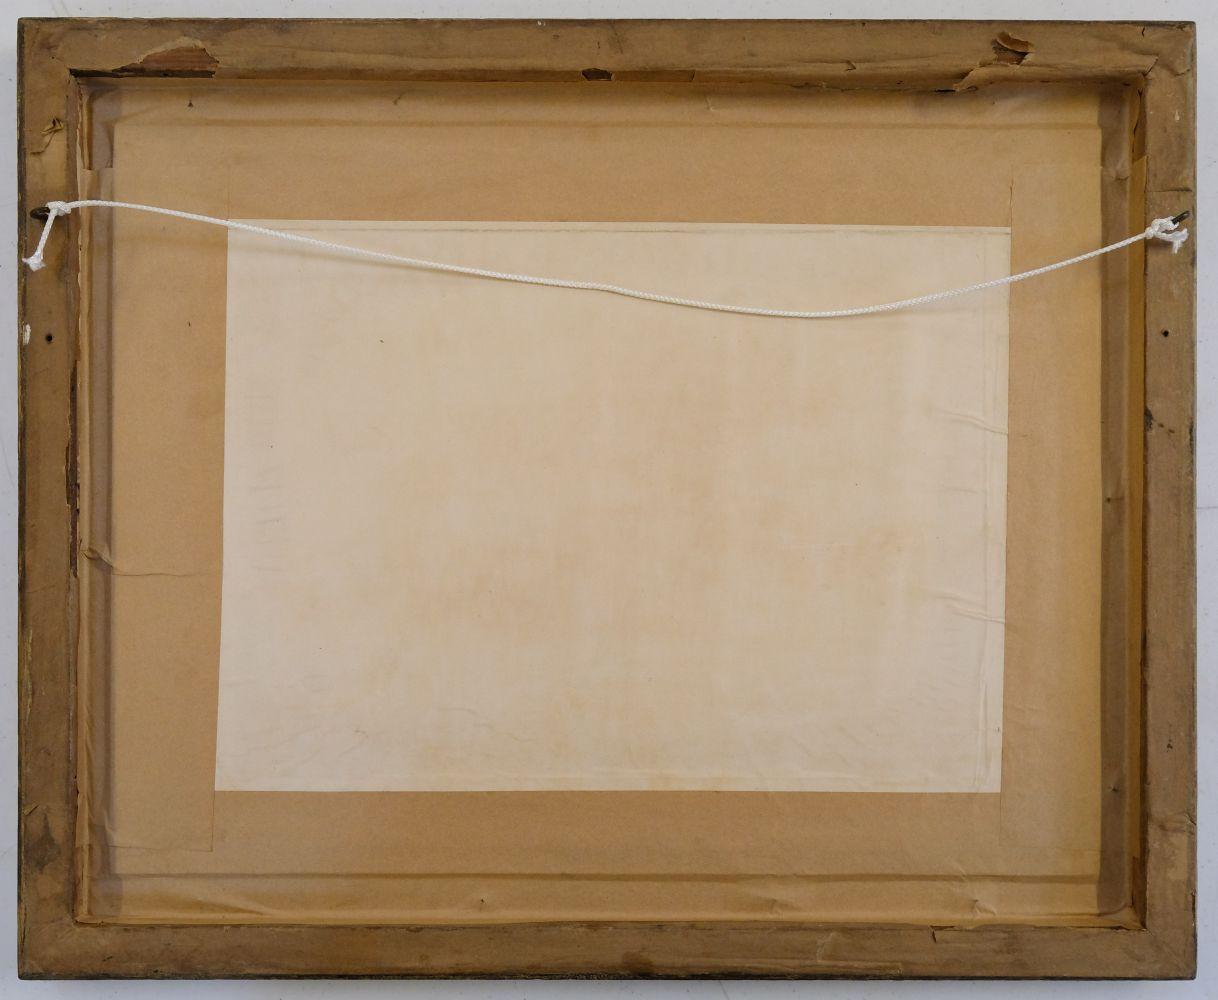 * Elgood (George S., 1851-1943). San Gimignano, 1881 - Image 6 of 6